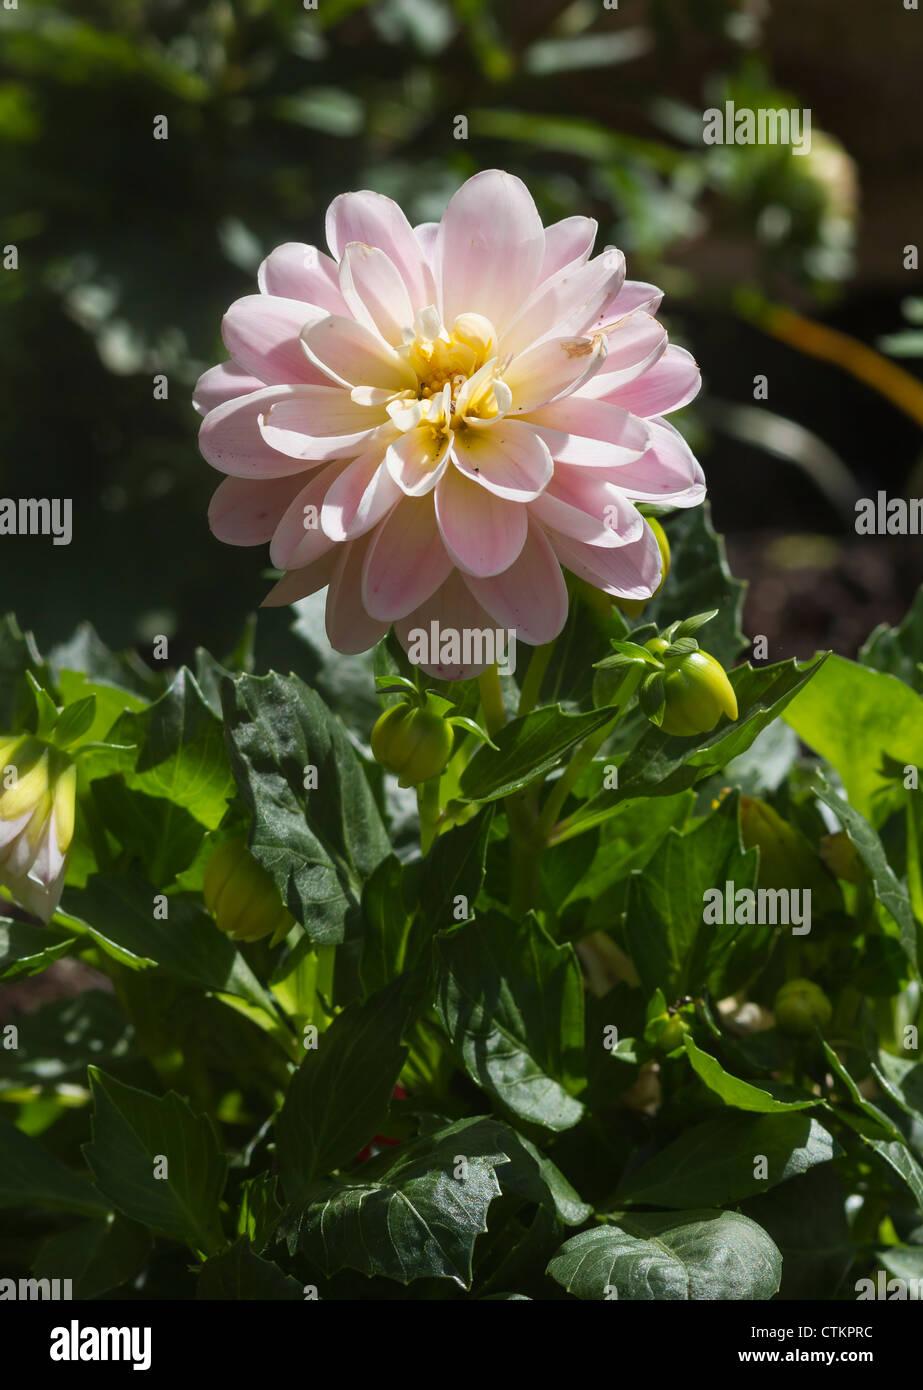 A beautiful pink Dahlia flower close up - Stock Image